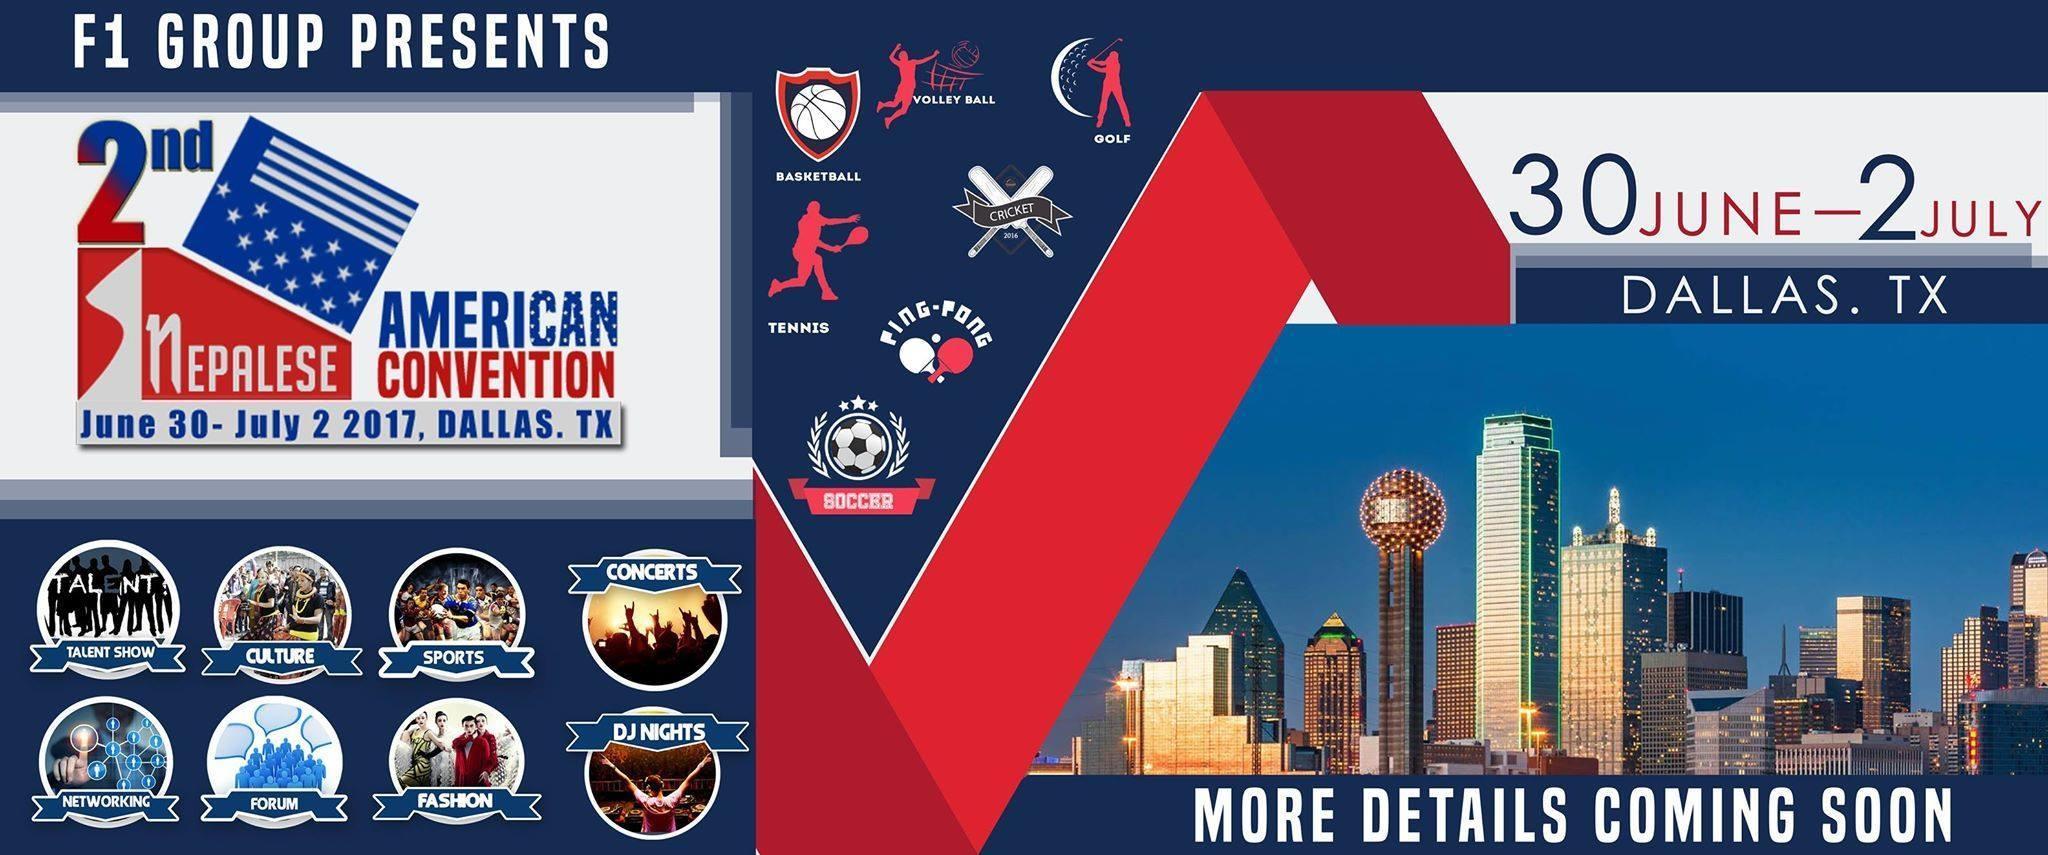 दोस्रो एन ए सी  फुटबल : बाल्टिमोर सहित अमेरिकाको उत्कृस्ट आठ फुटबल नेपाली टिम दर्ता